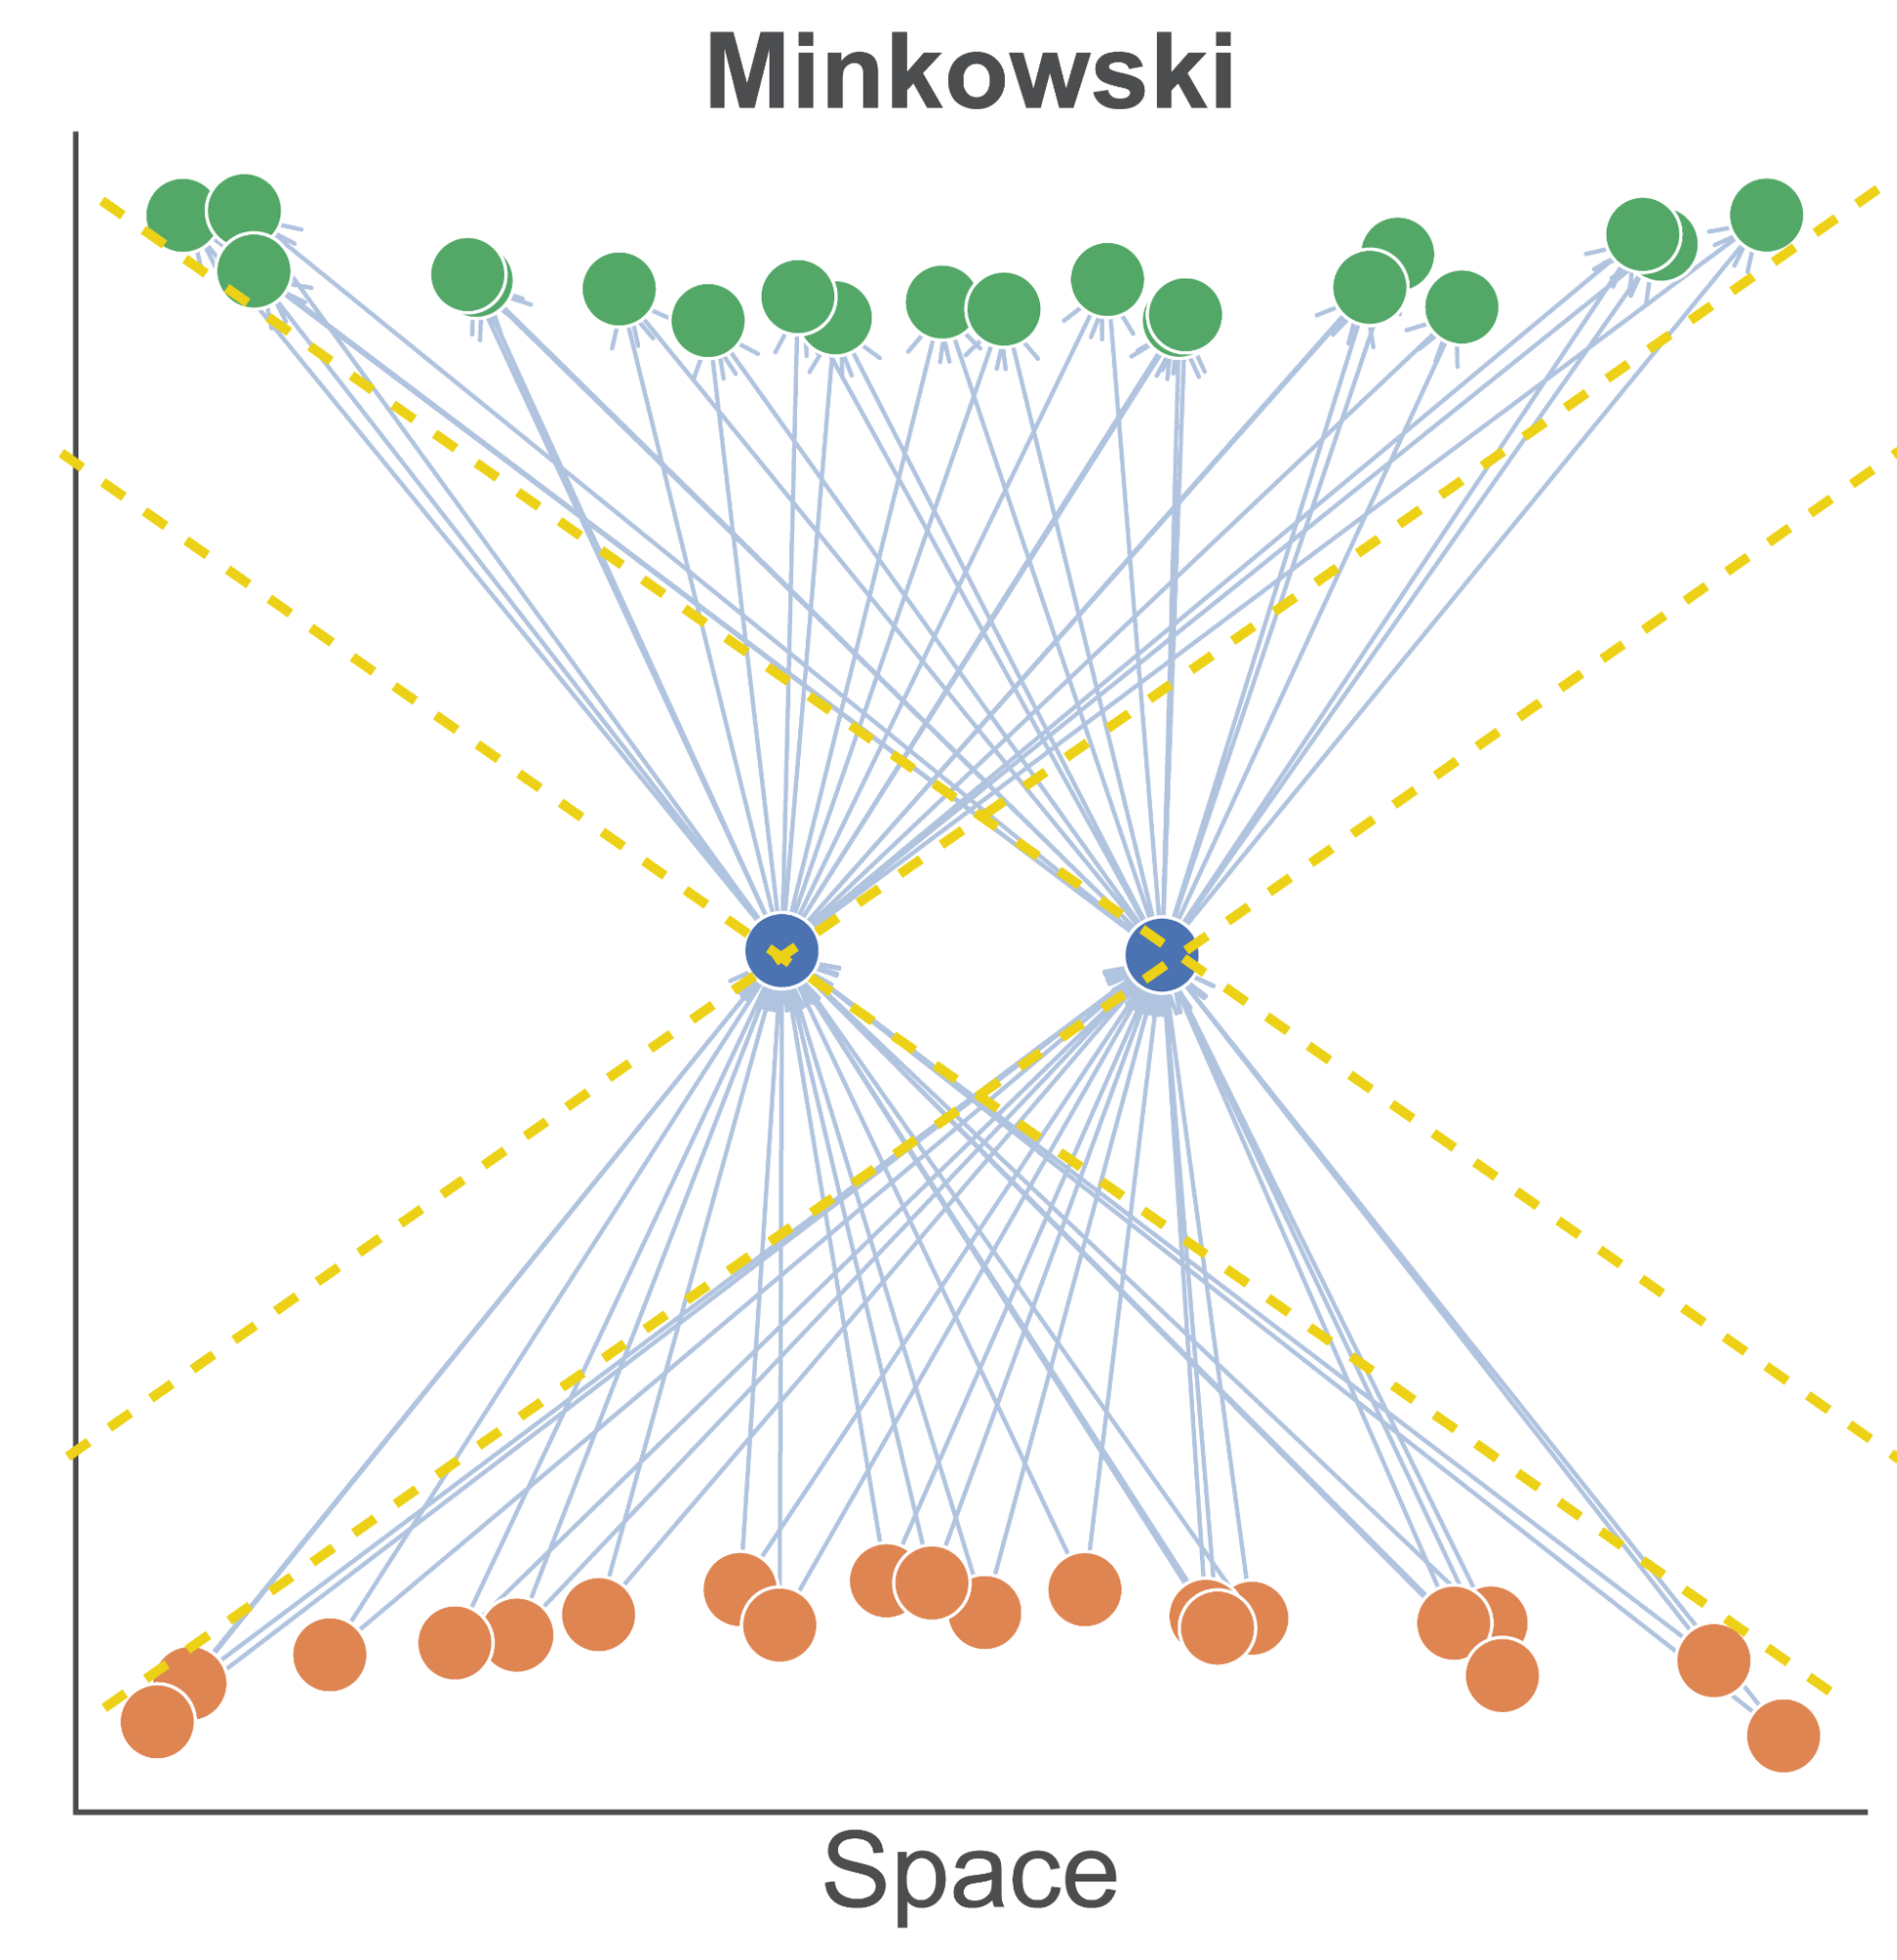 Flat Minkowski spacetime